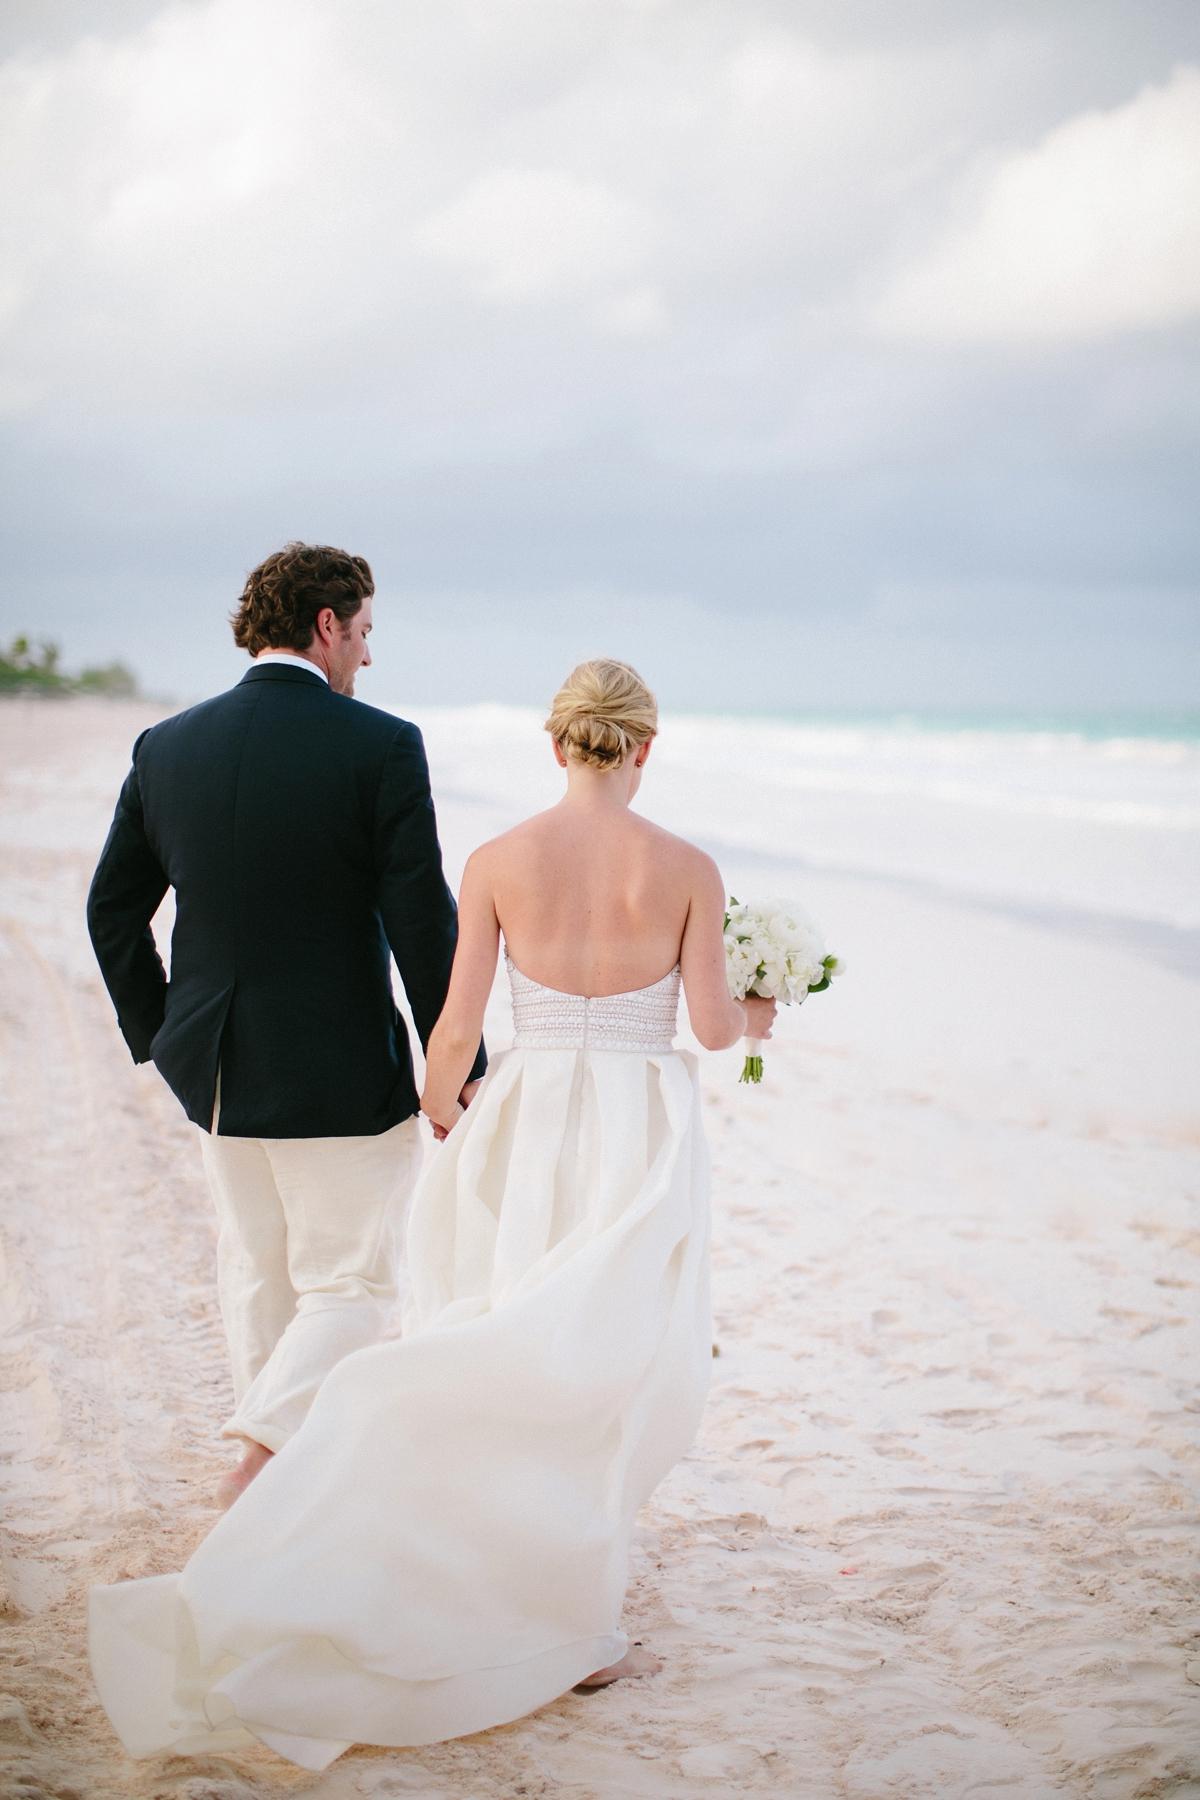 harbour_island-wedding-photographer-briland-destination-_0040.jpg